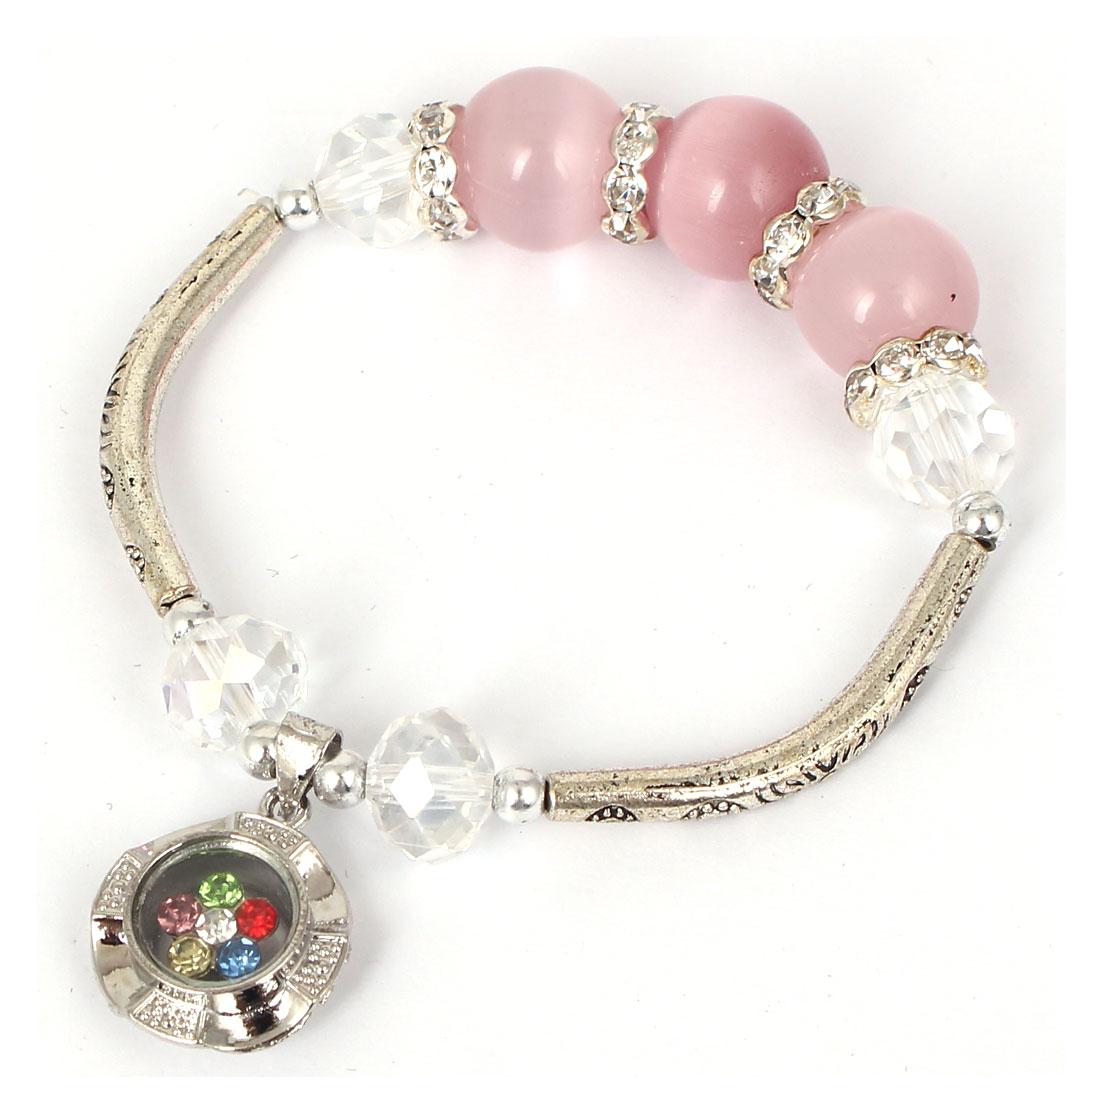 Women Faux Crystal Decor Cat Eye Round Bead Stretchy Bangle Bracelet Light Pink